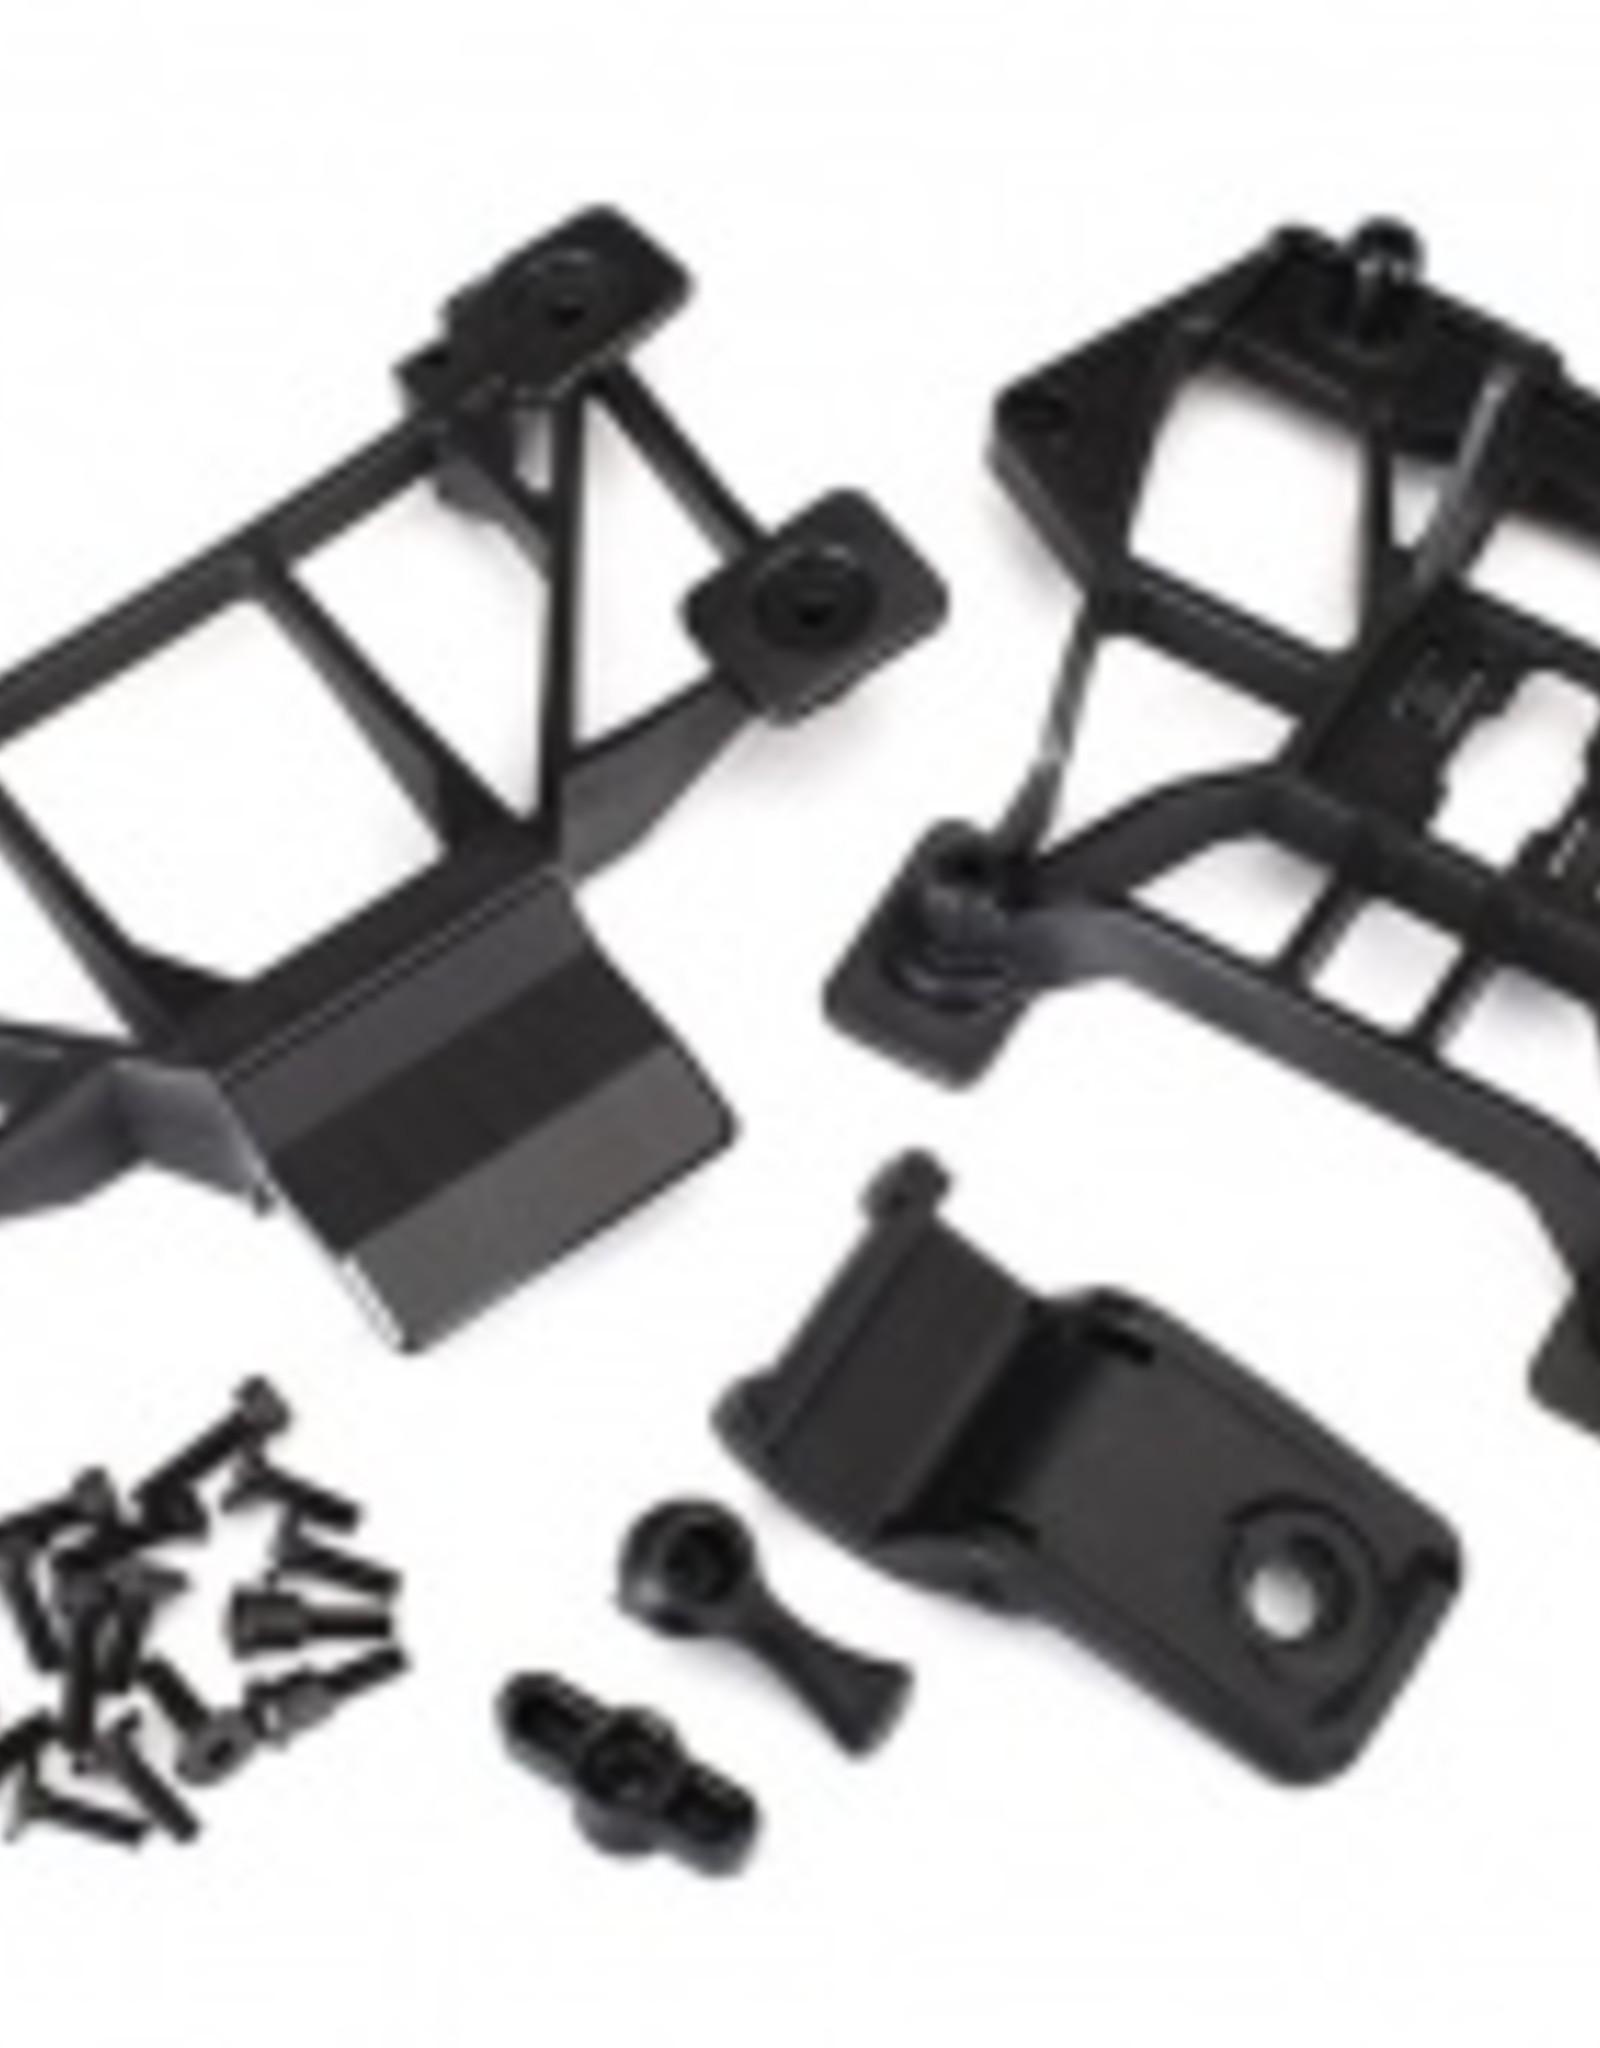 Traxxas Traxxas E-Revo 2.0 Body mounts, front & rear/ 3x12mm CS (4)/ 3x12mm shoulder screw (2)/ 3x10mm flat-head machine screw (8)/ 3x12mm BCS (1)